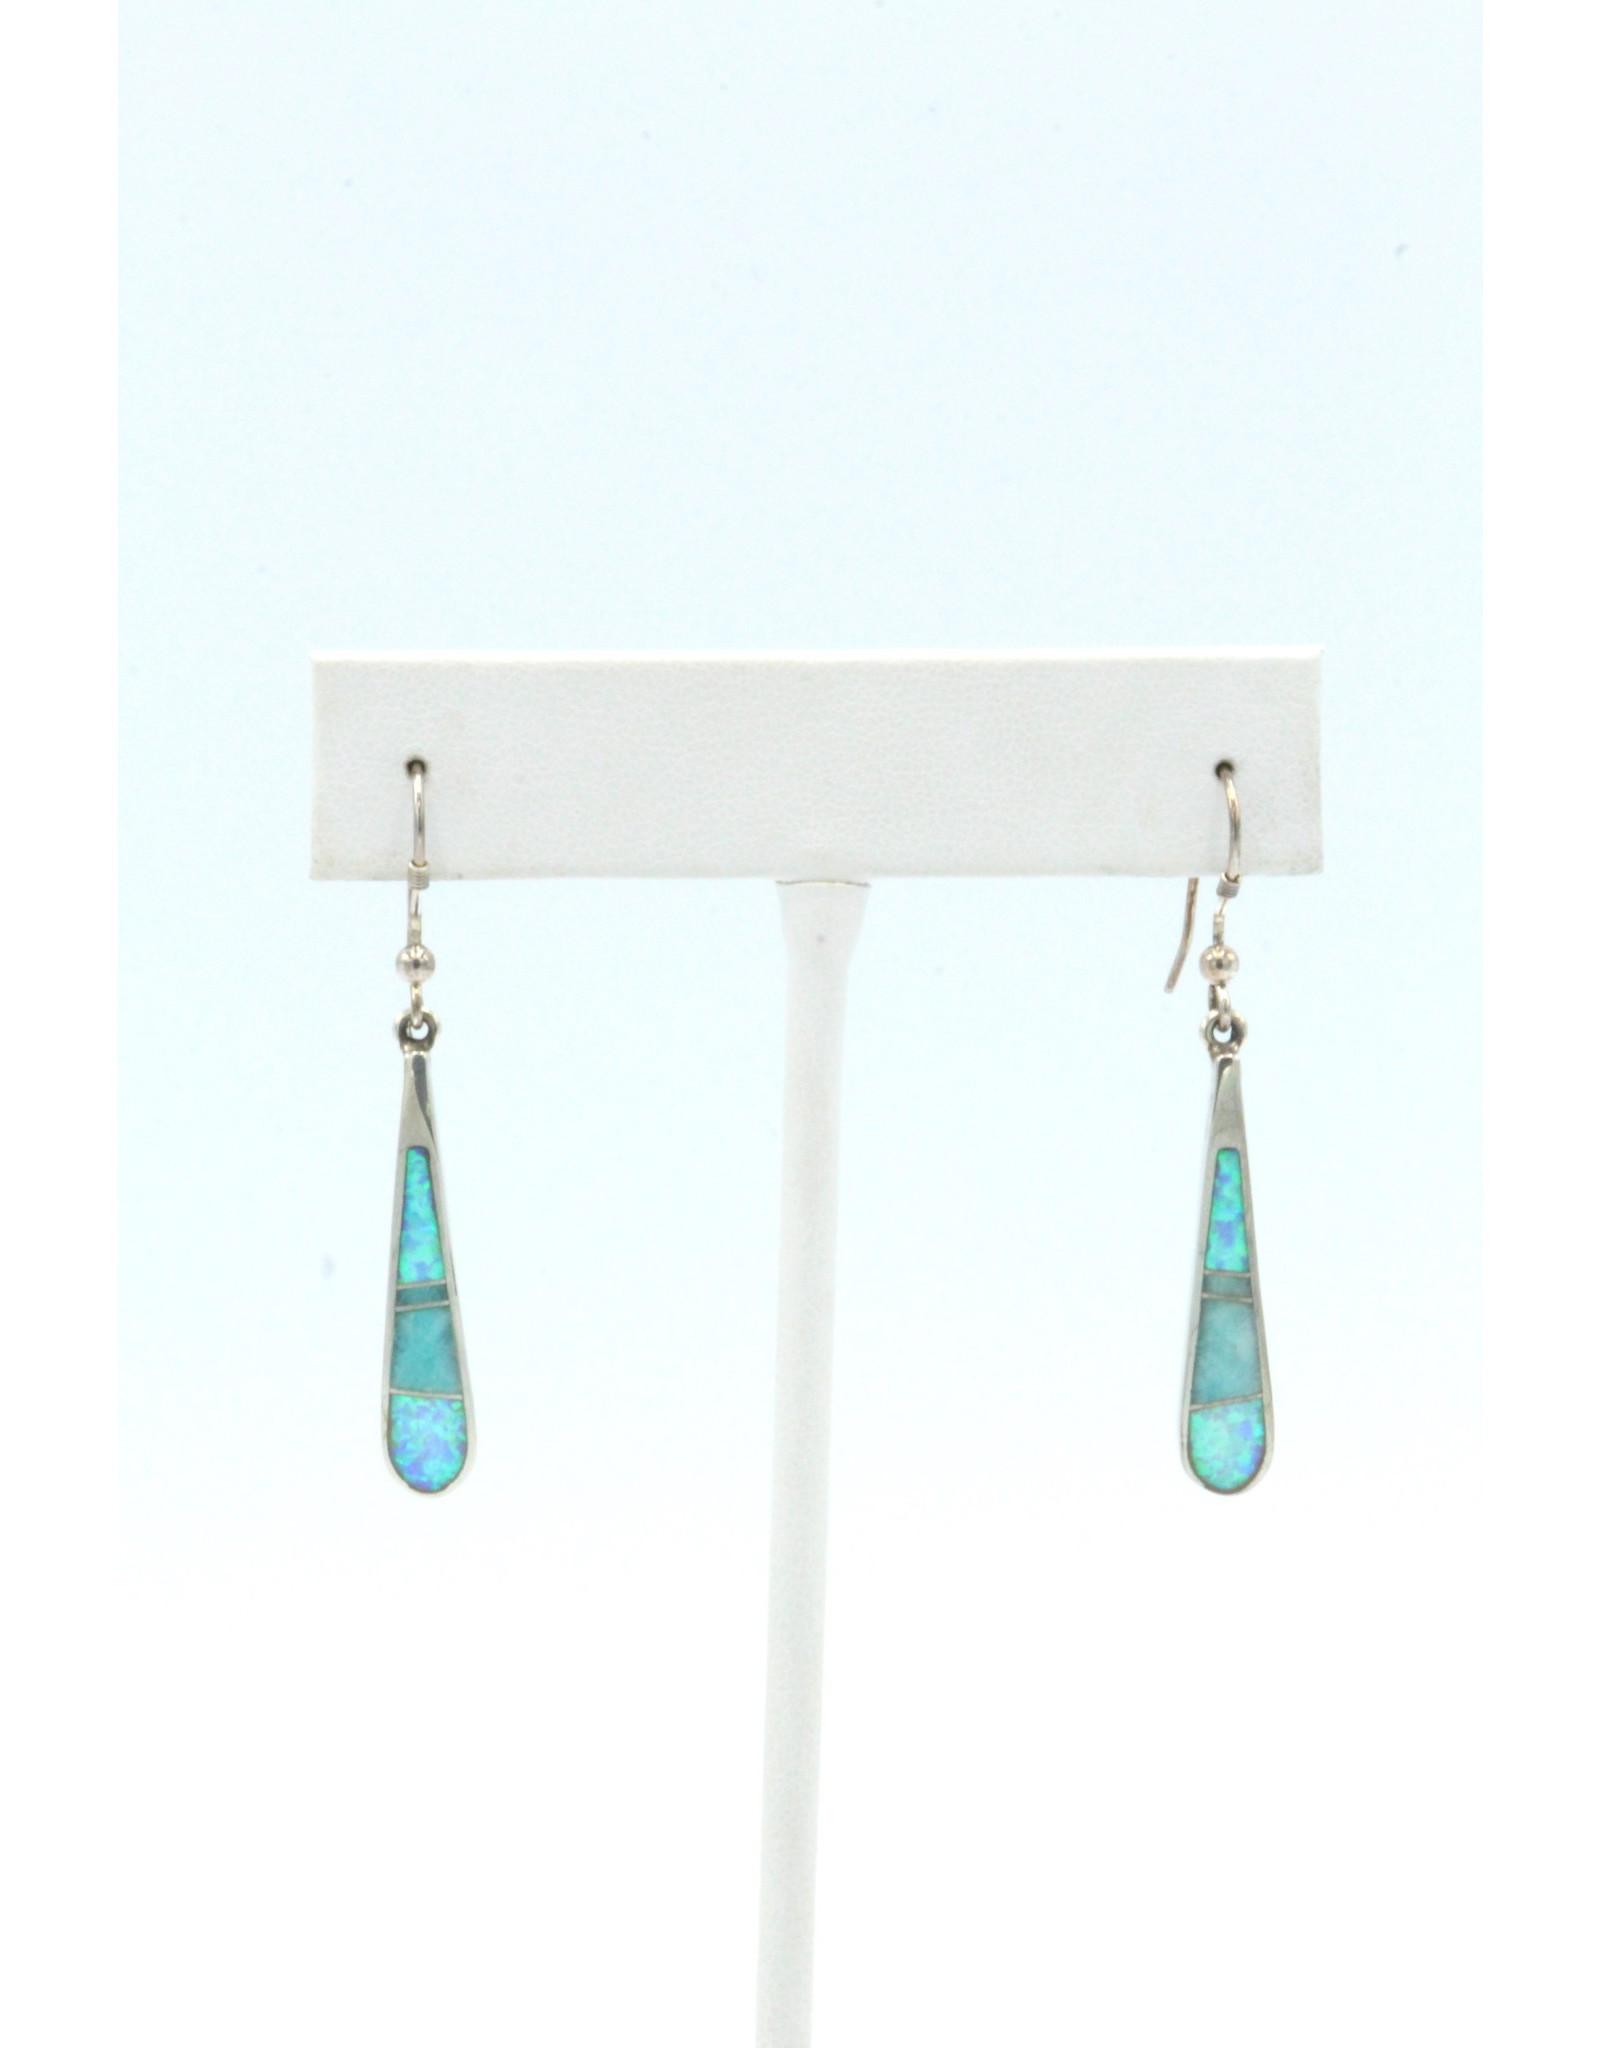 Tear Earrings - TEAL2